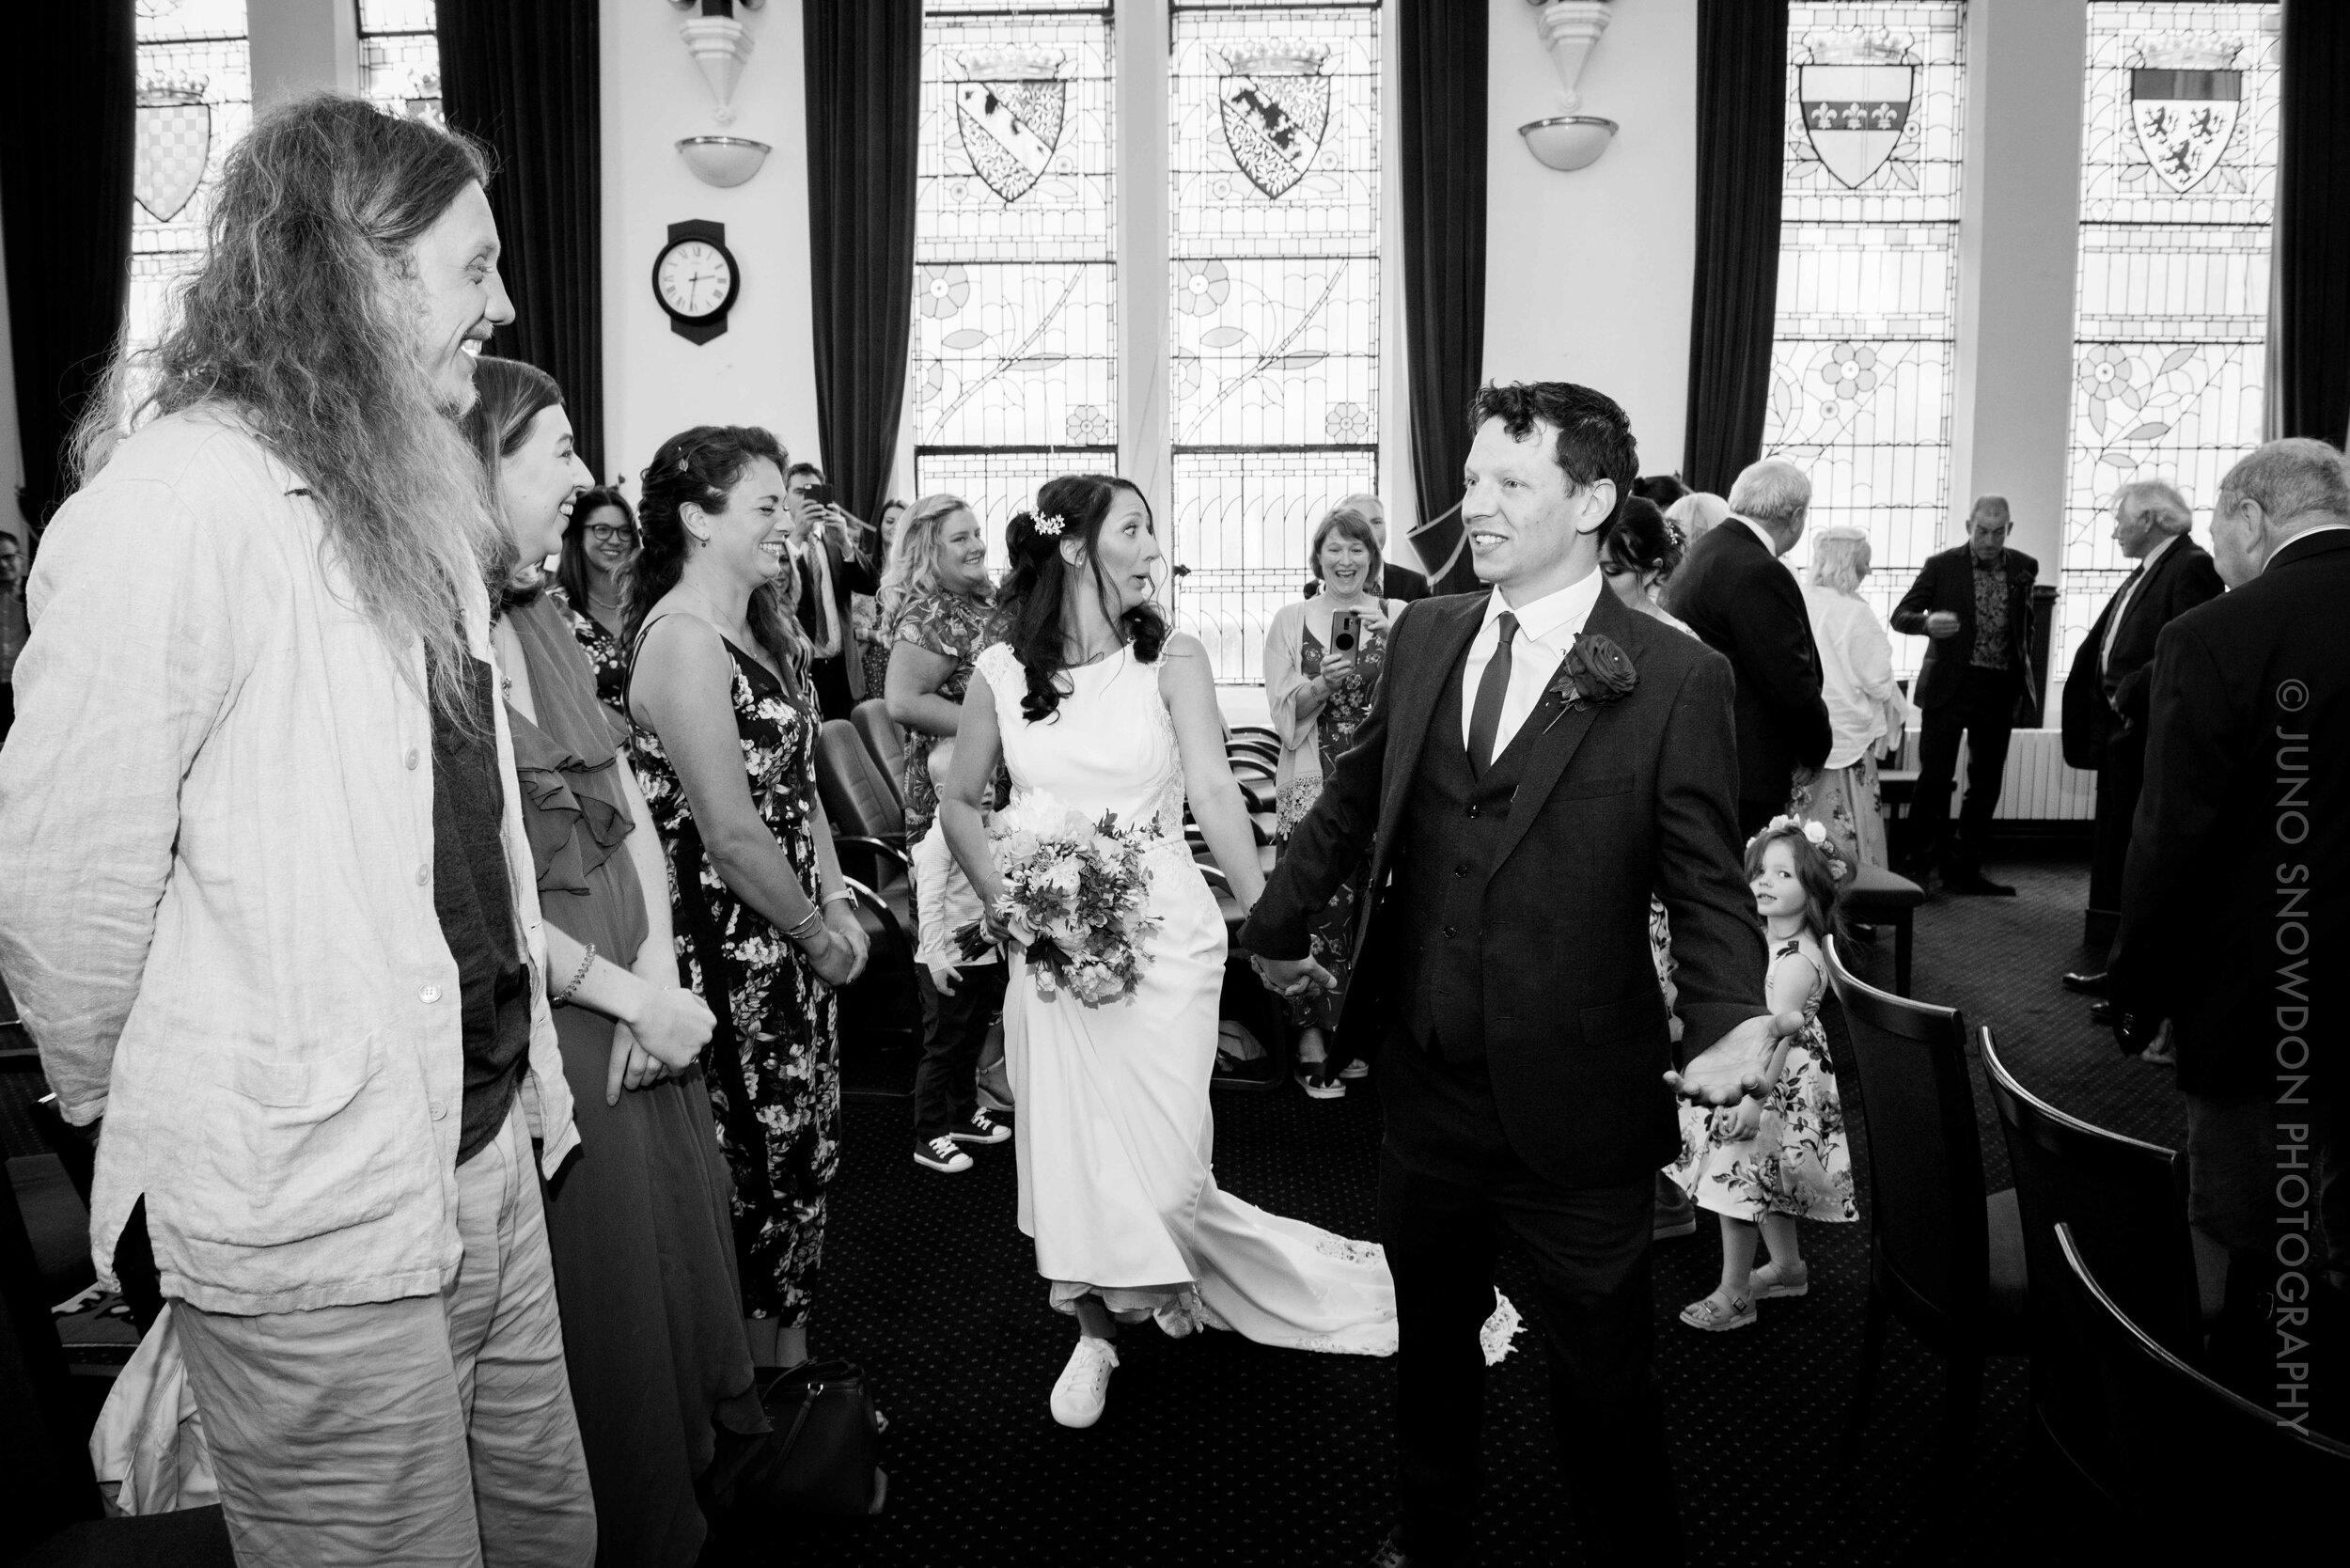 juno-snowdon-photography-wedding-7360.jpg